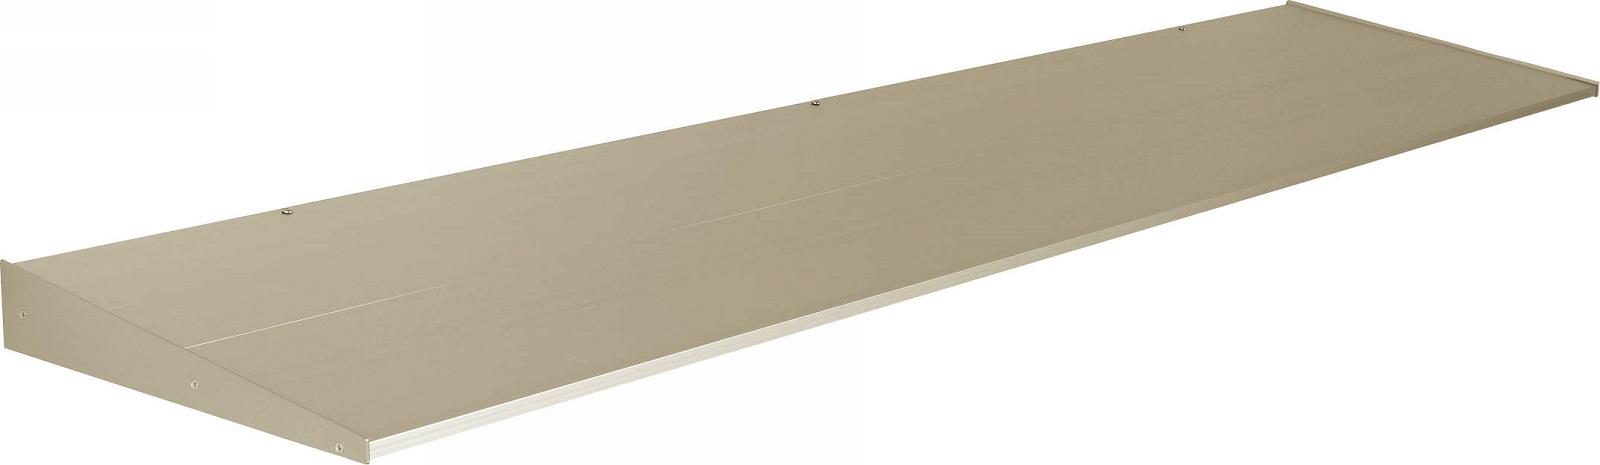 YKKAP窓まわり ひさし コンバイザー モダンスタイル 出幅400mm:先付・後付兼用[幅1440mm×高60mm]